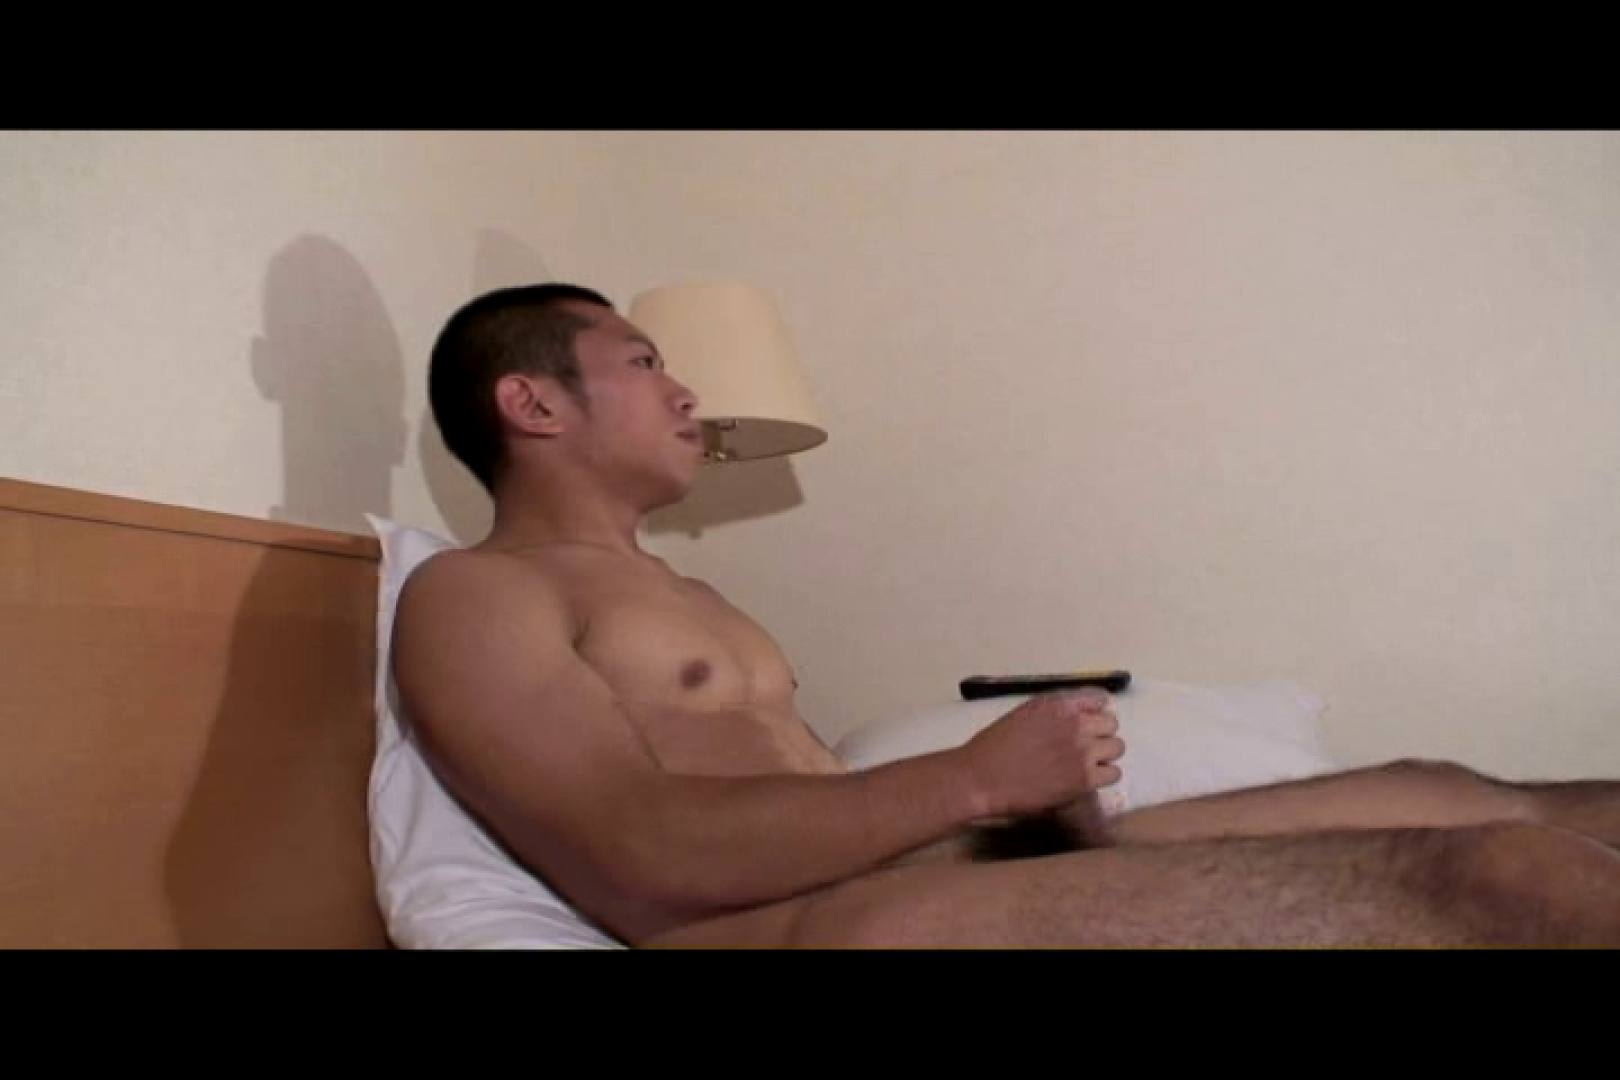 Bistro「イケメン」~Mokkori和風仕立て~vol.04 スポーツマン ゲイヌード画像 91枚 60